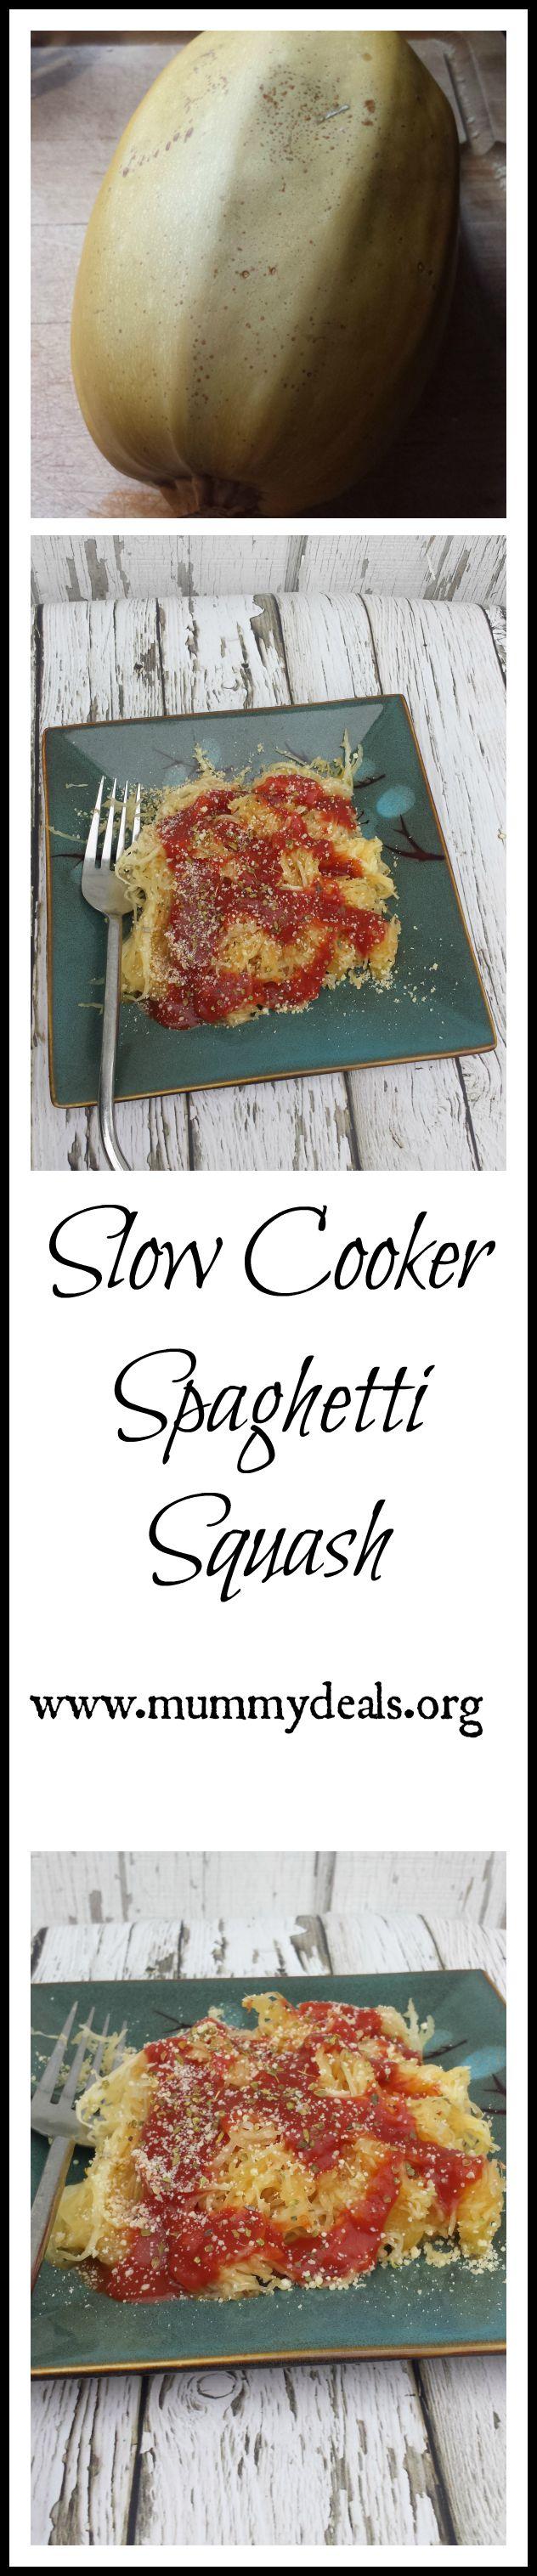 Slow Cooker Spaghetti Squash Main